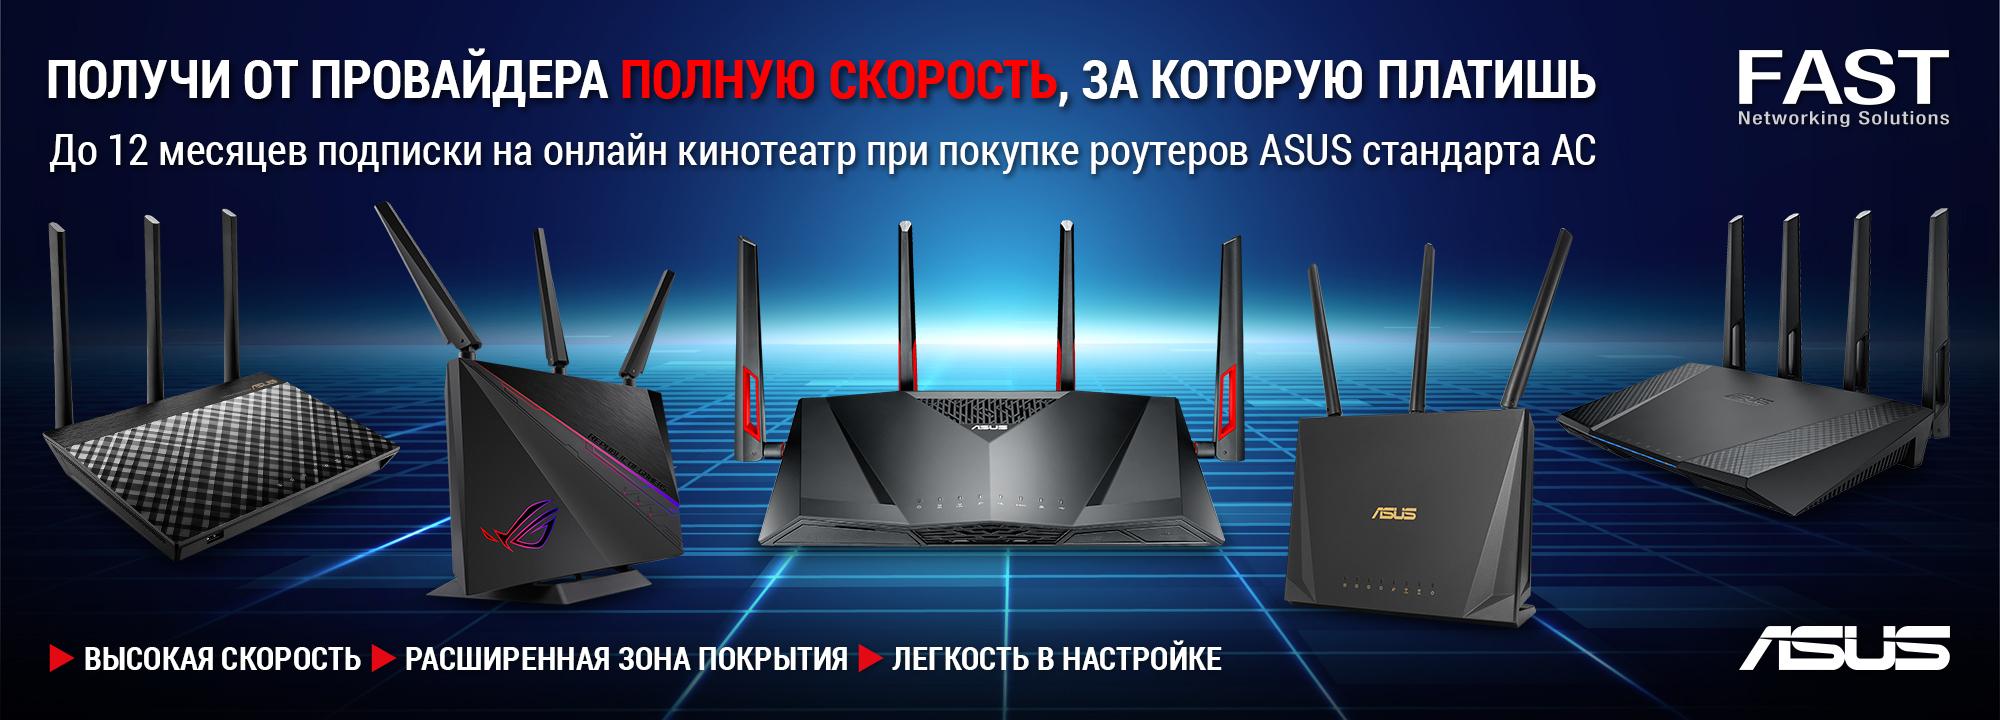 N-AC_ASUS_2280x760_rus_1-min